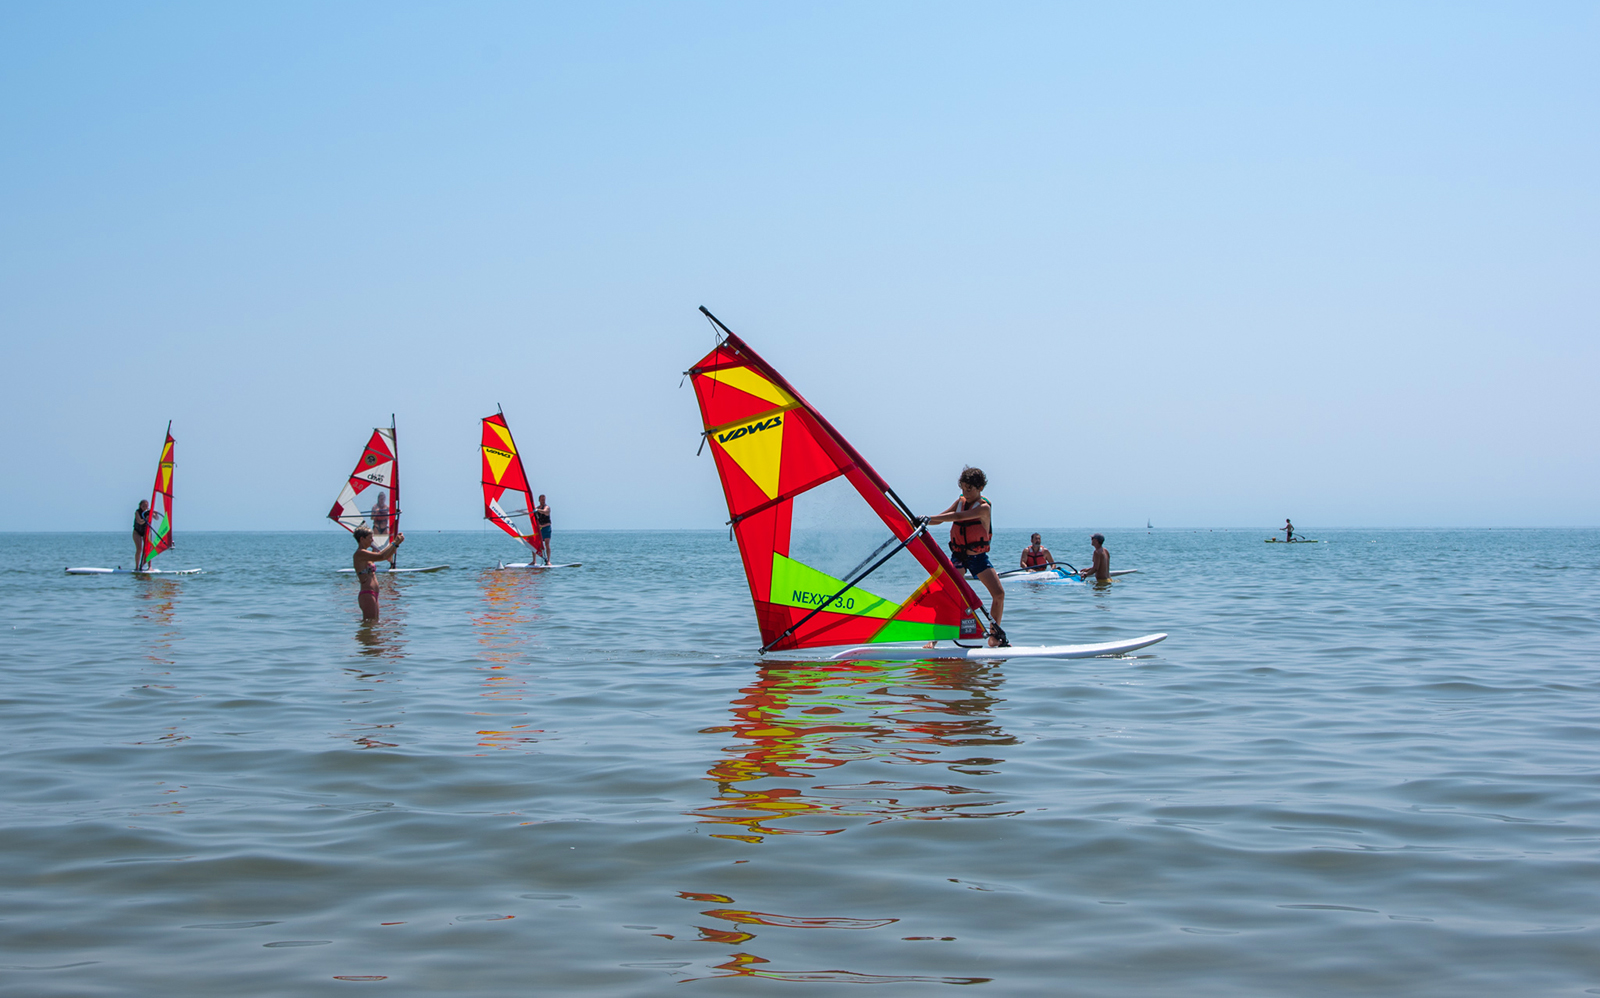 6-Scuola-surf-campeggio-campingplatz-Mediterraneo